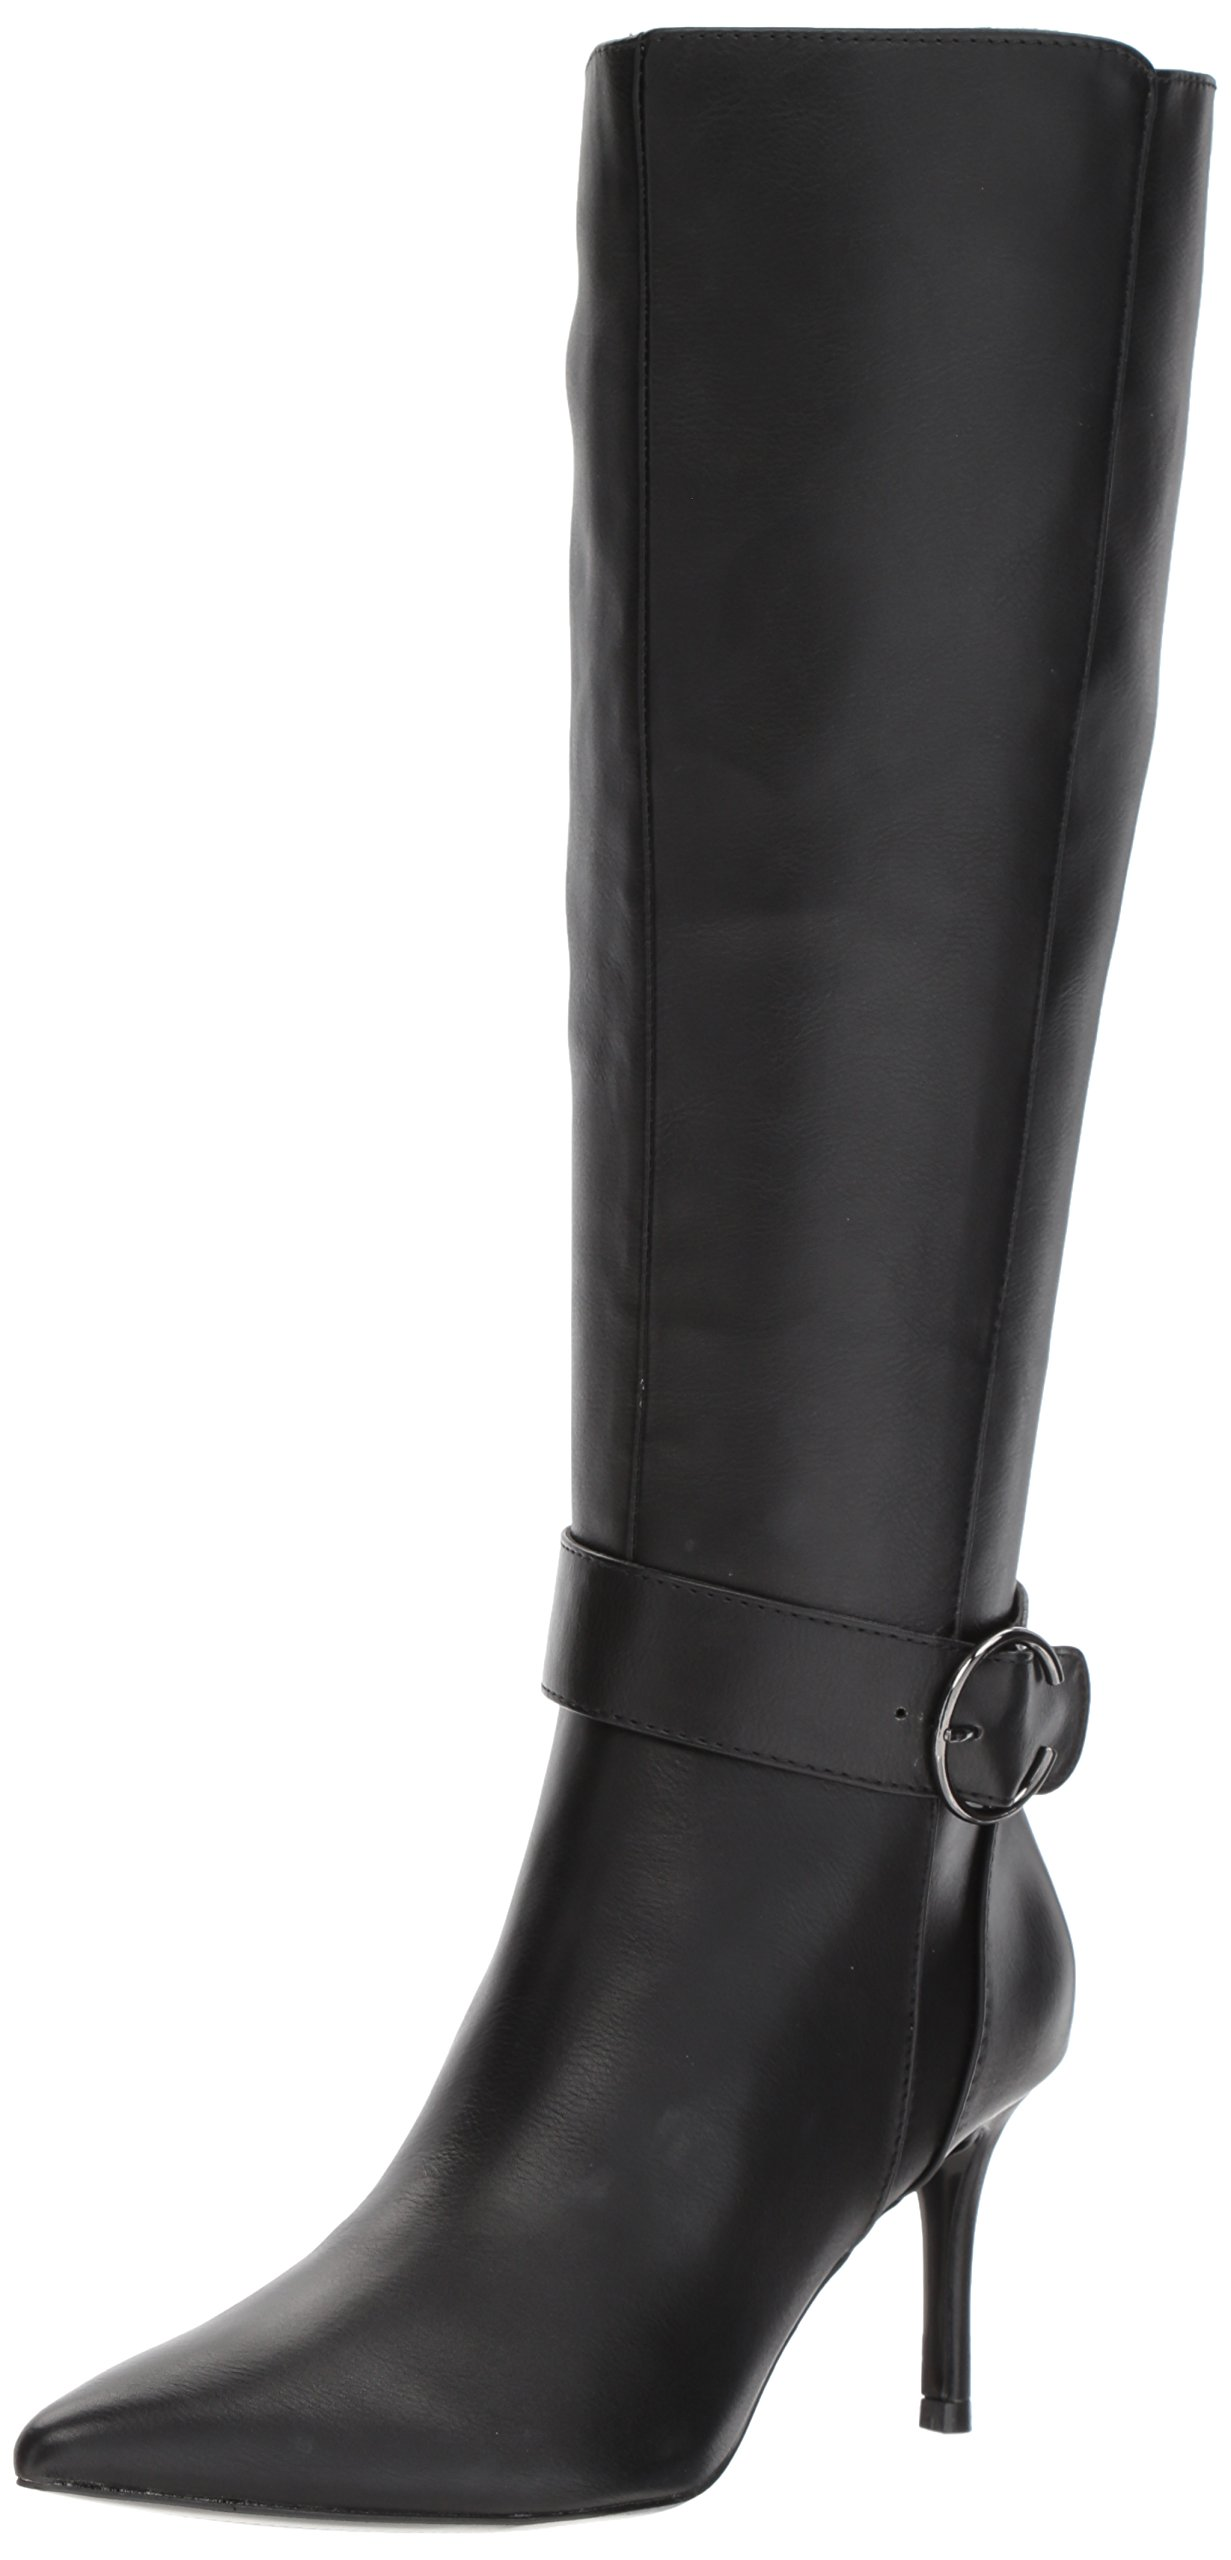 Nine West Women's Moretalkn Synthetic Knee High Boot, Black Synthetic, 5 Medium US